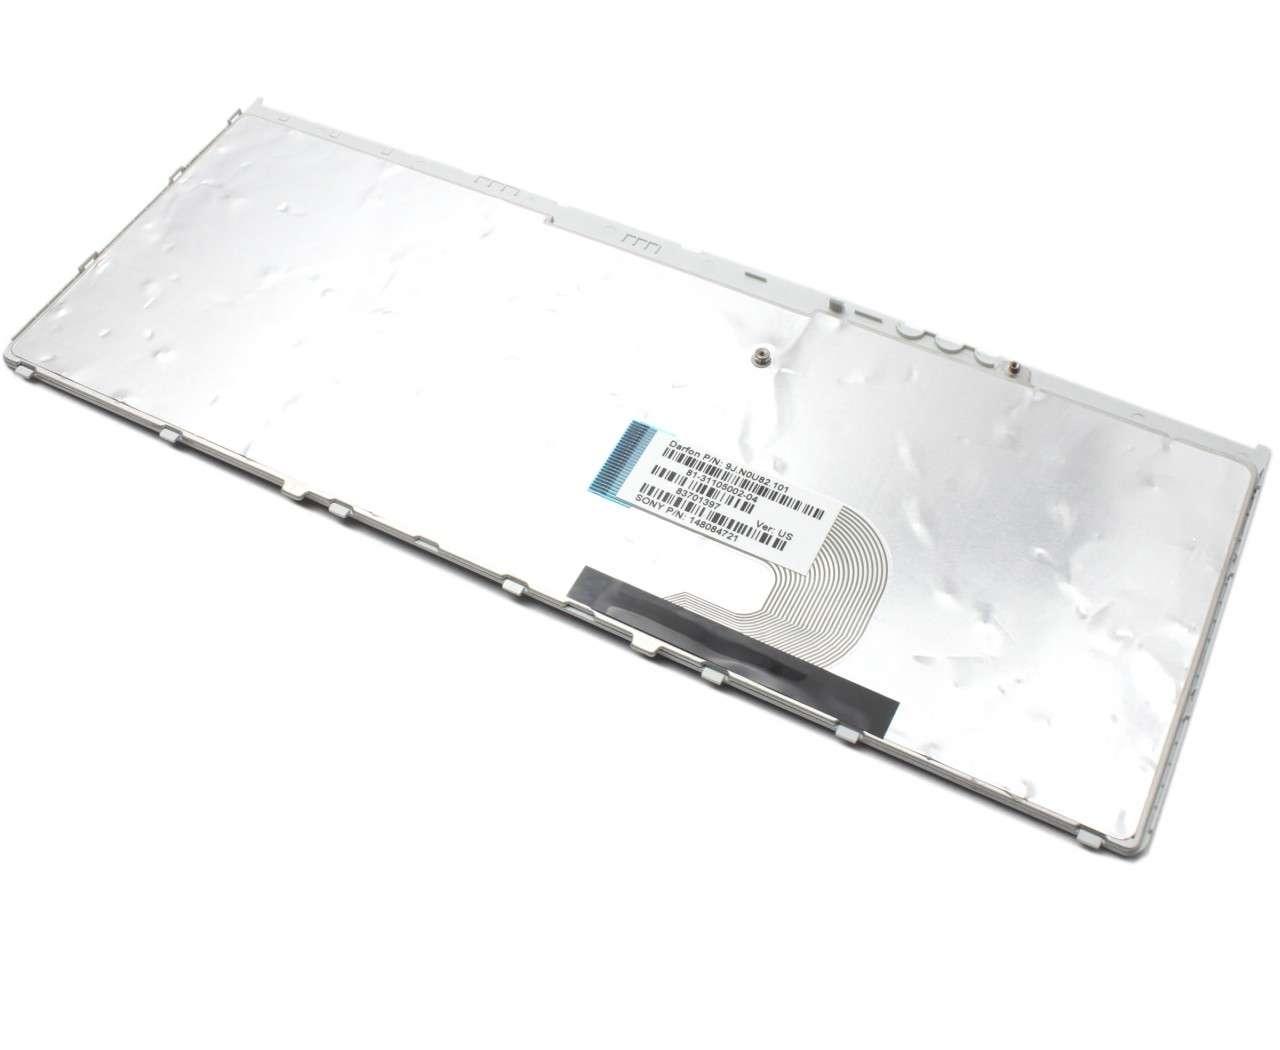 Tastatura Sony Vaio VGN-FW139EH neagra cu rama gri imagine powerlaptop.ro 2021